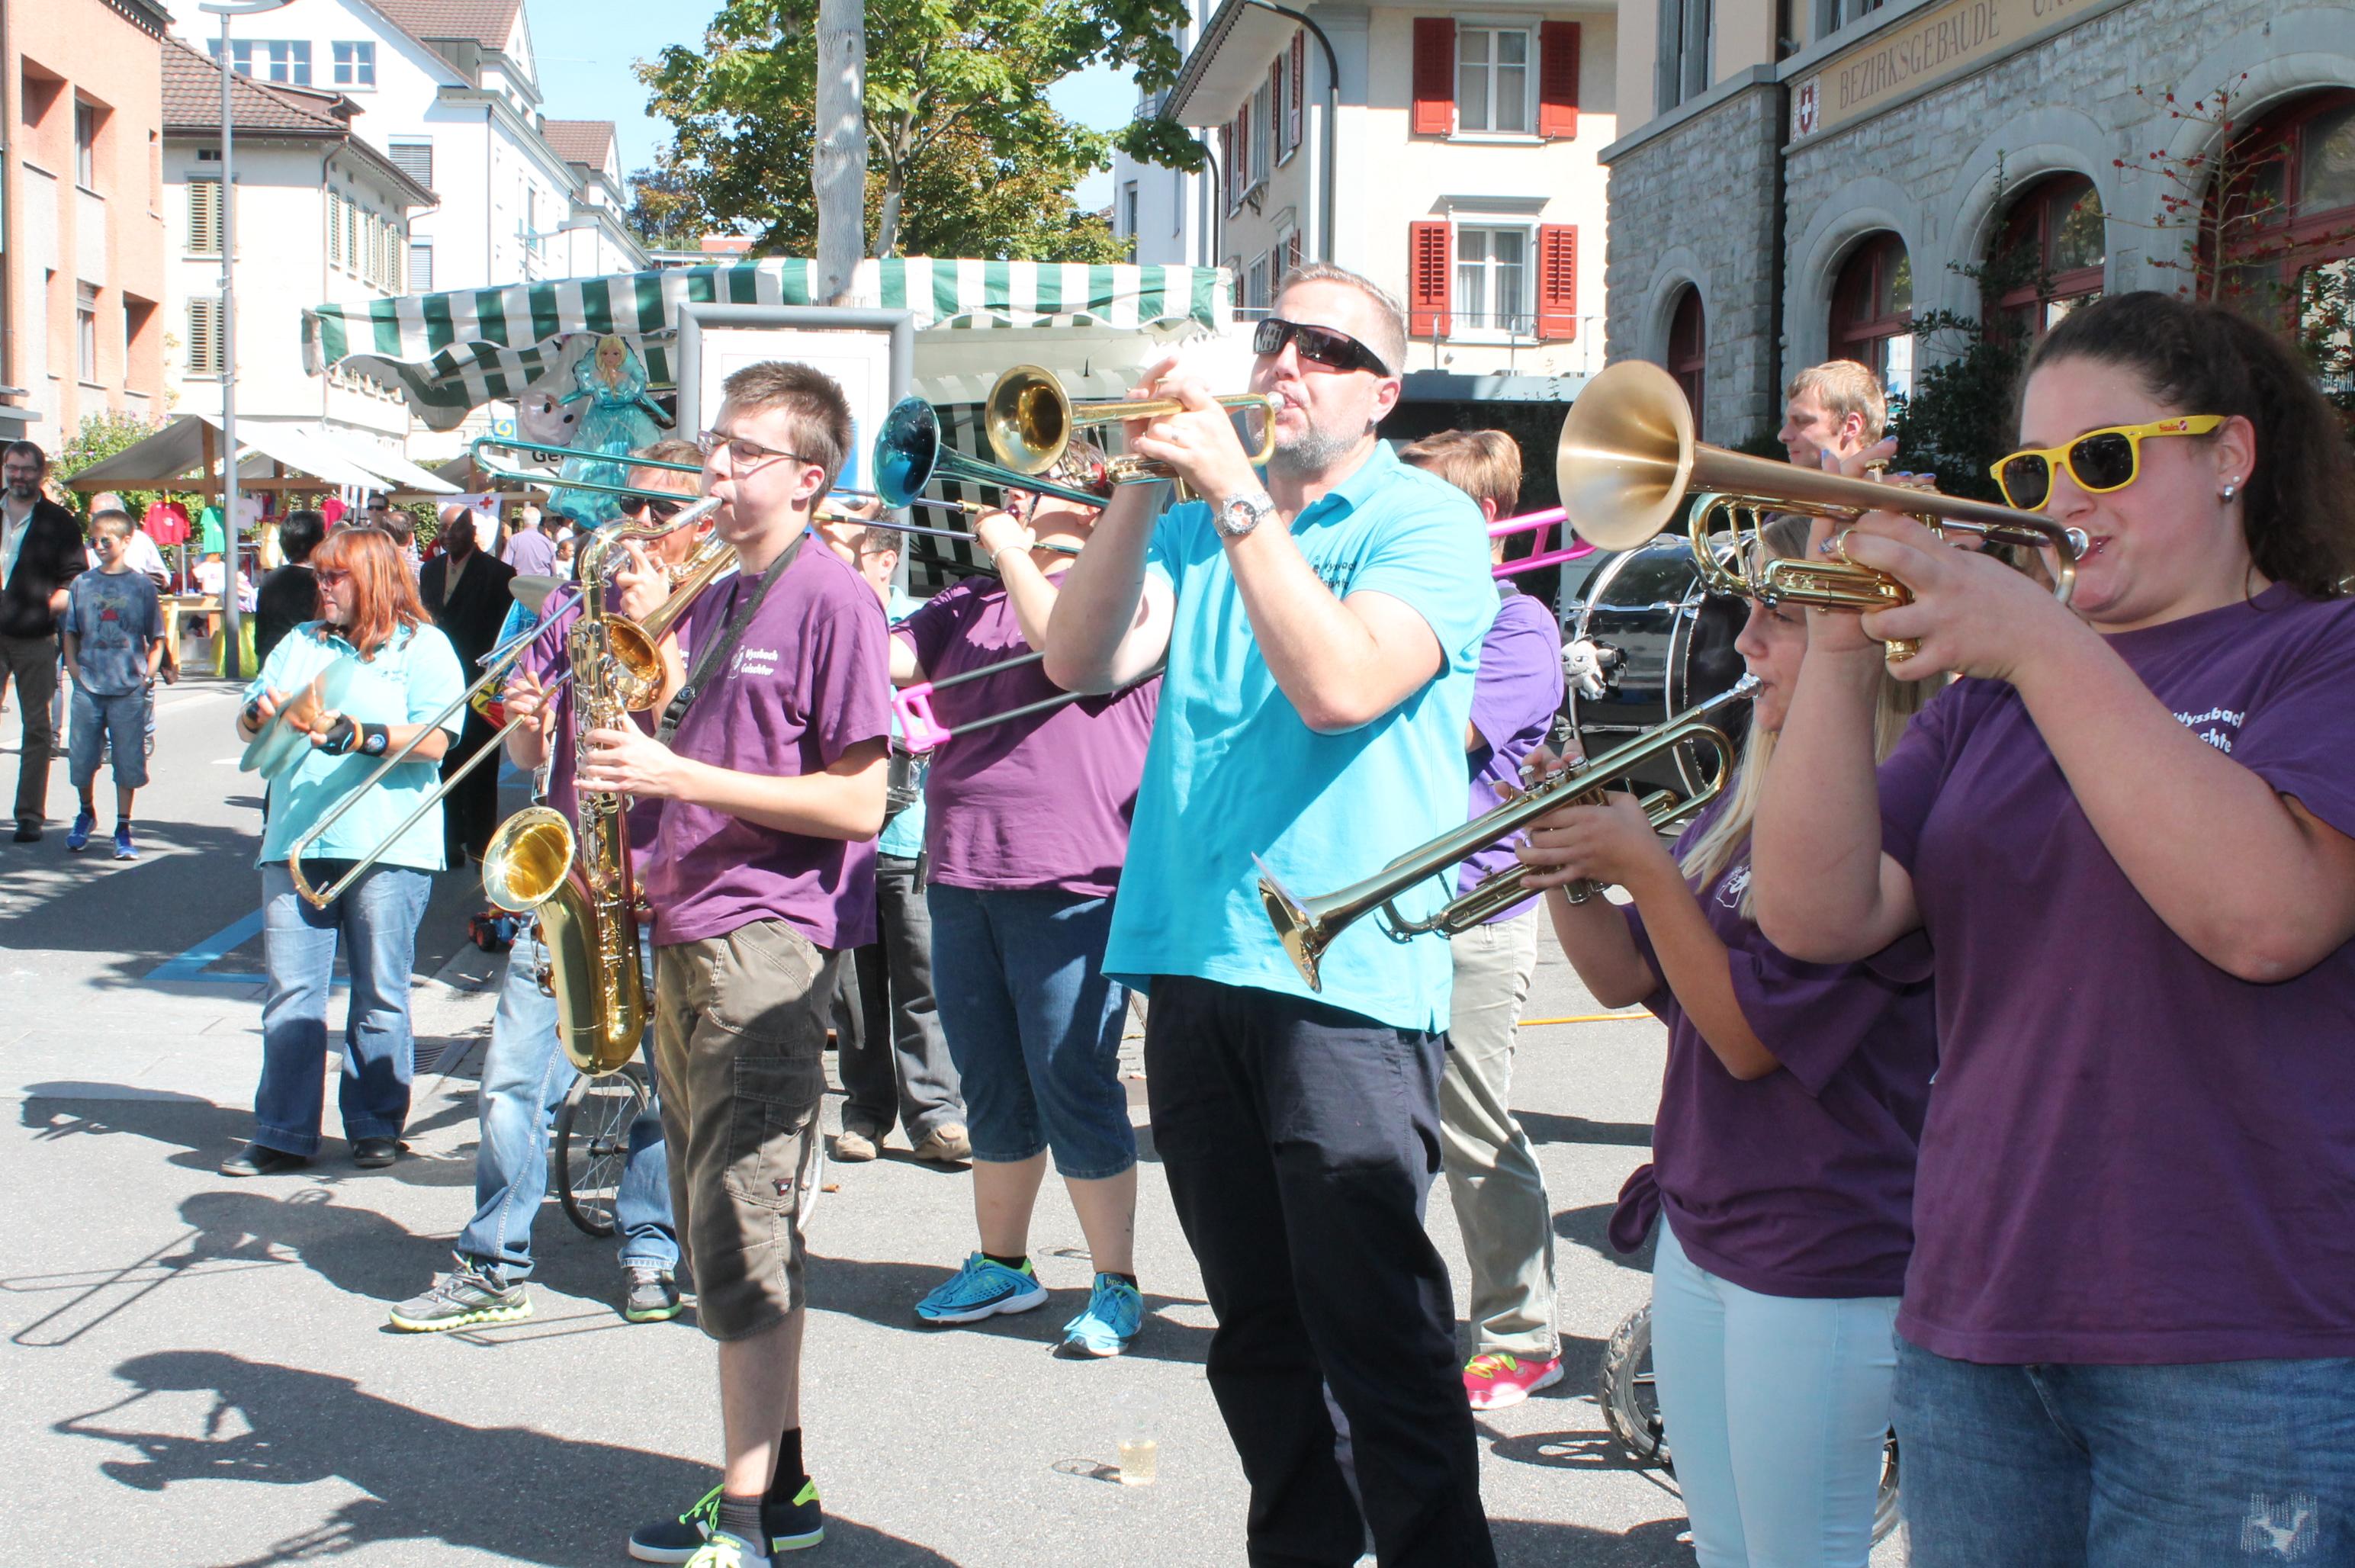 Flawiler Herbstmarkt: Ungeschminkte Guggenmusik (12.30 Uhr)